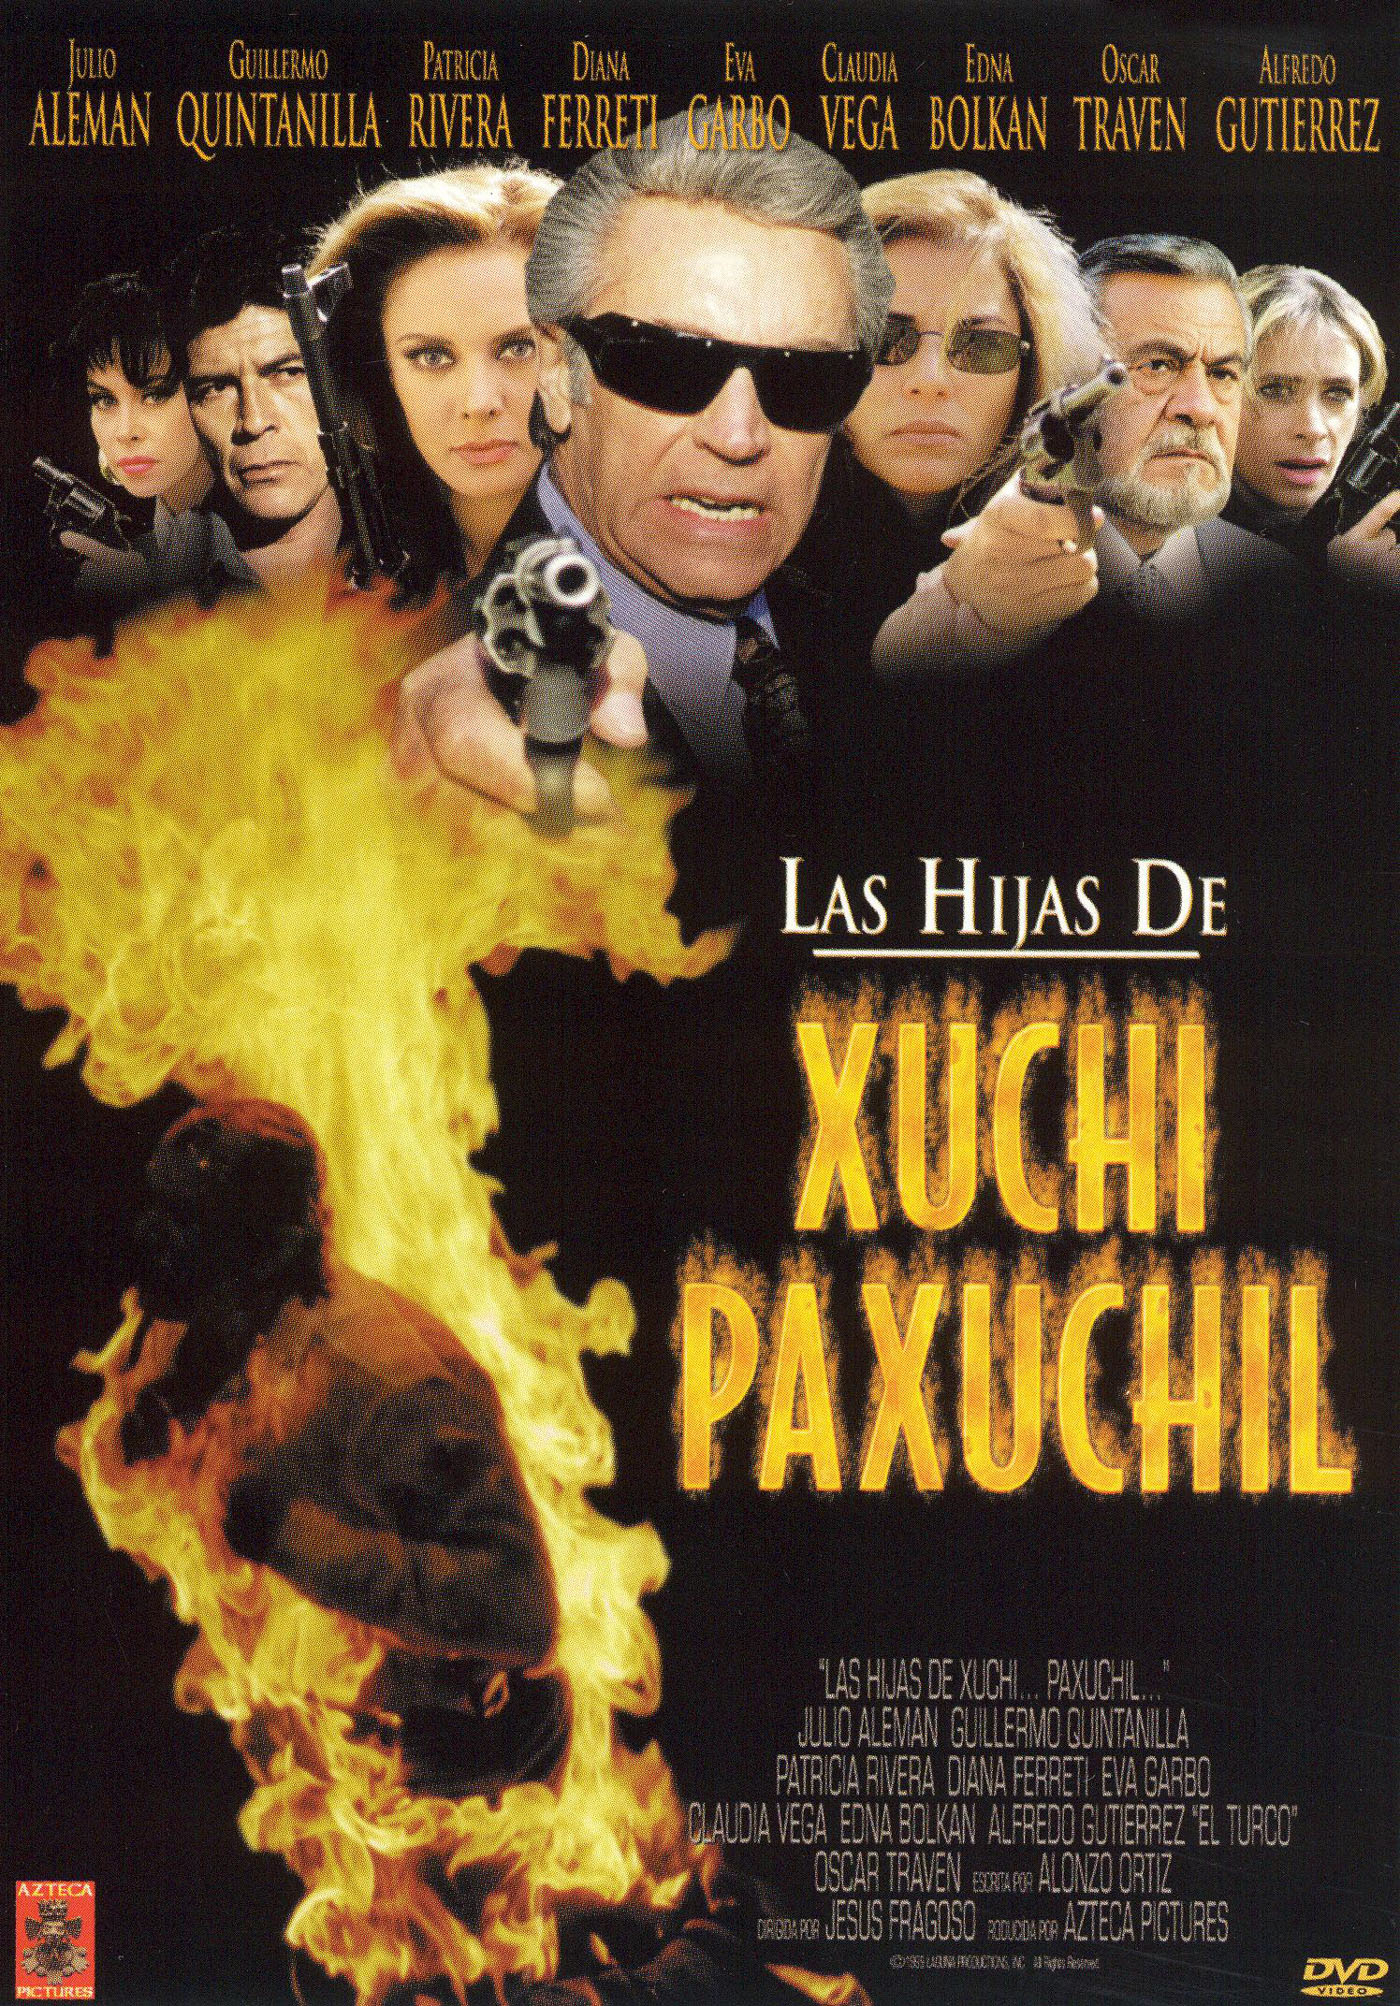 Las Hijas de Xuchi...Paxuchil